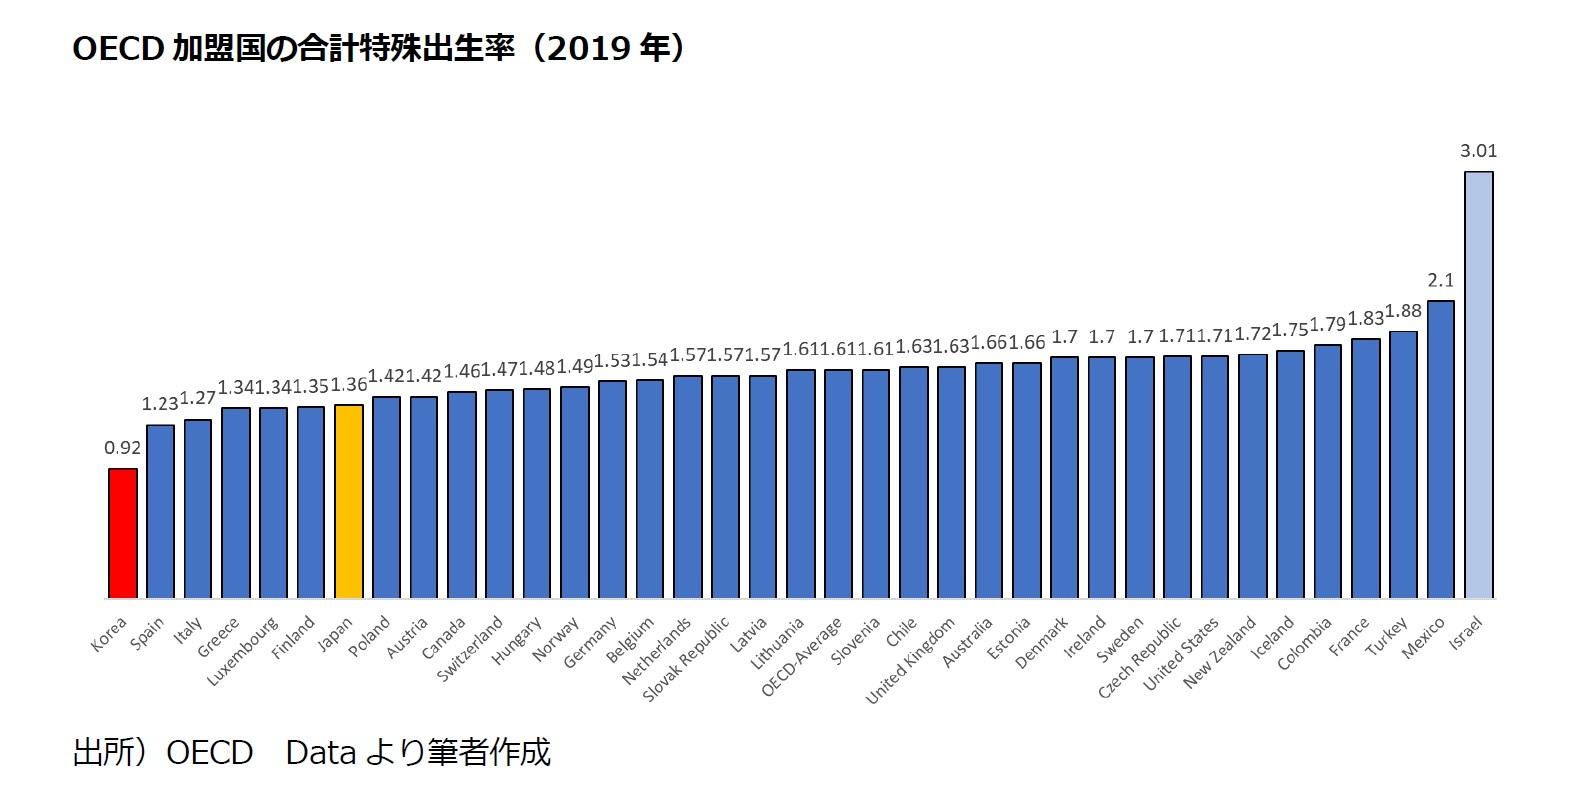 OECD加盟国の合計特殊出生率(2019年)